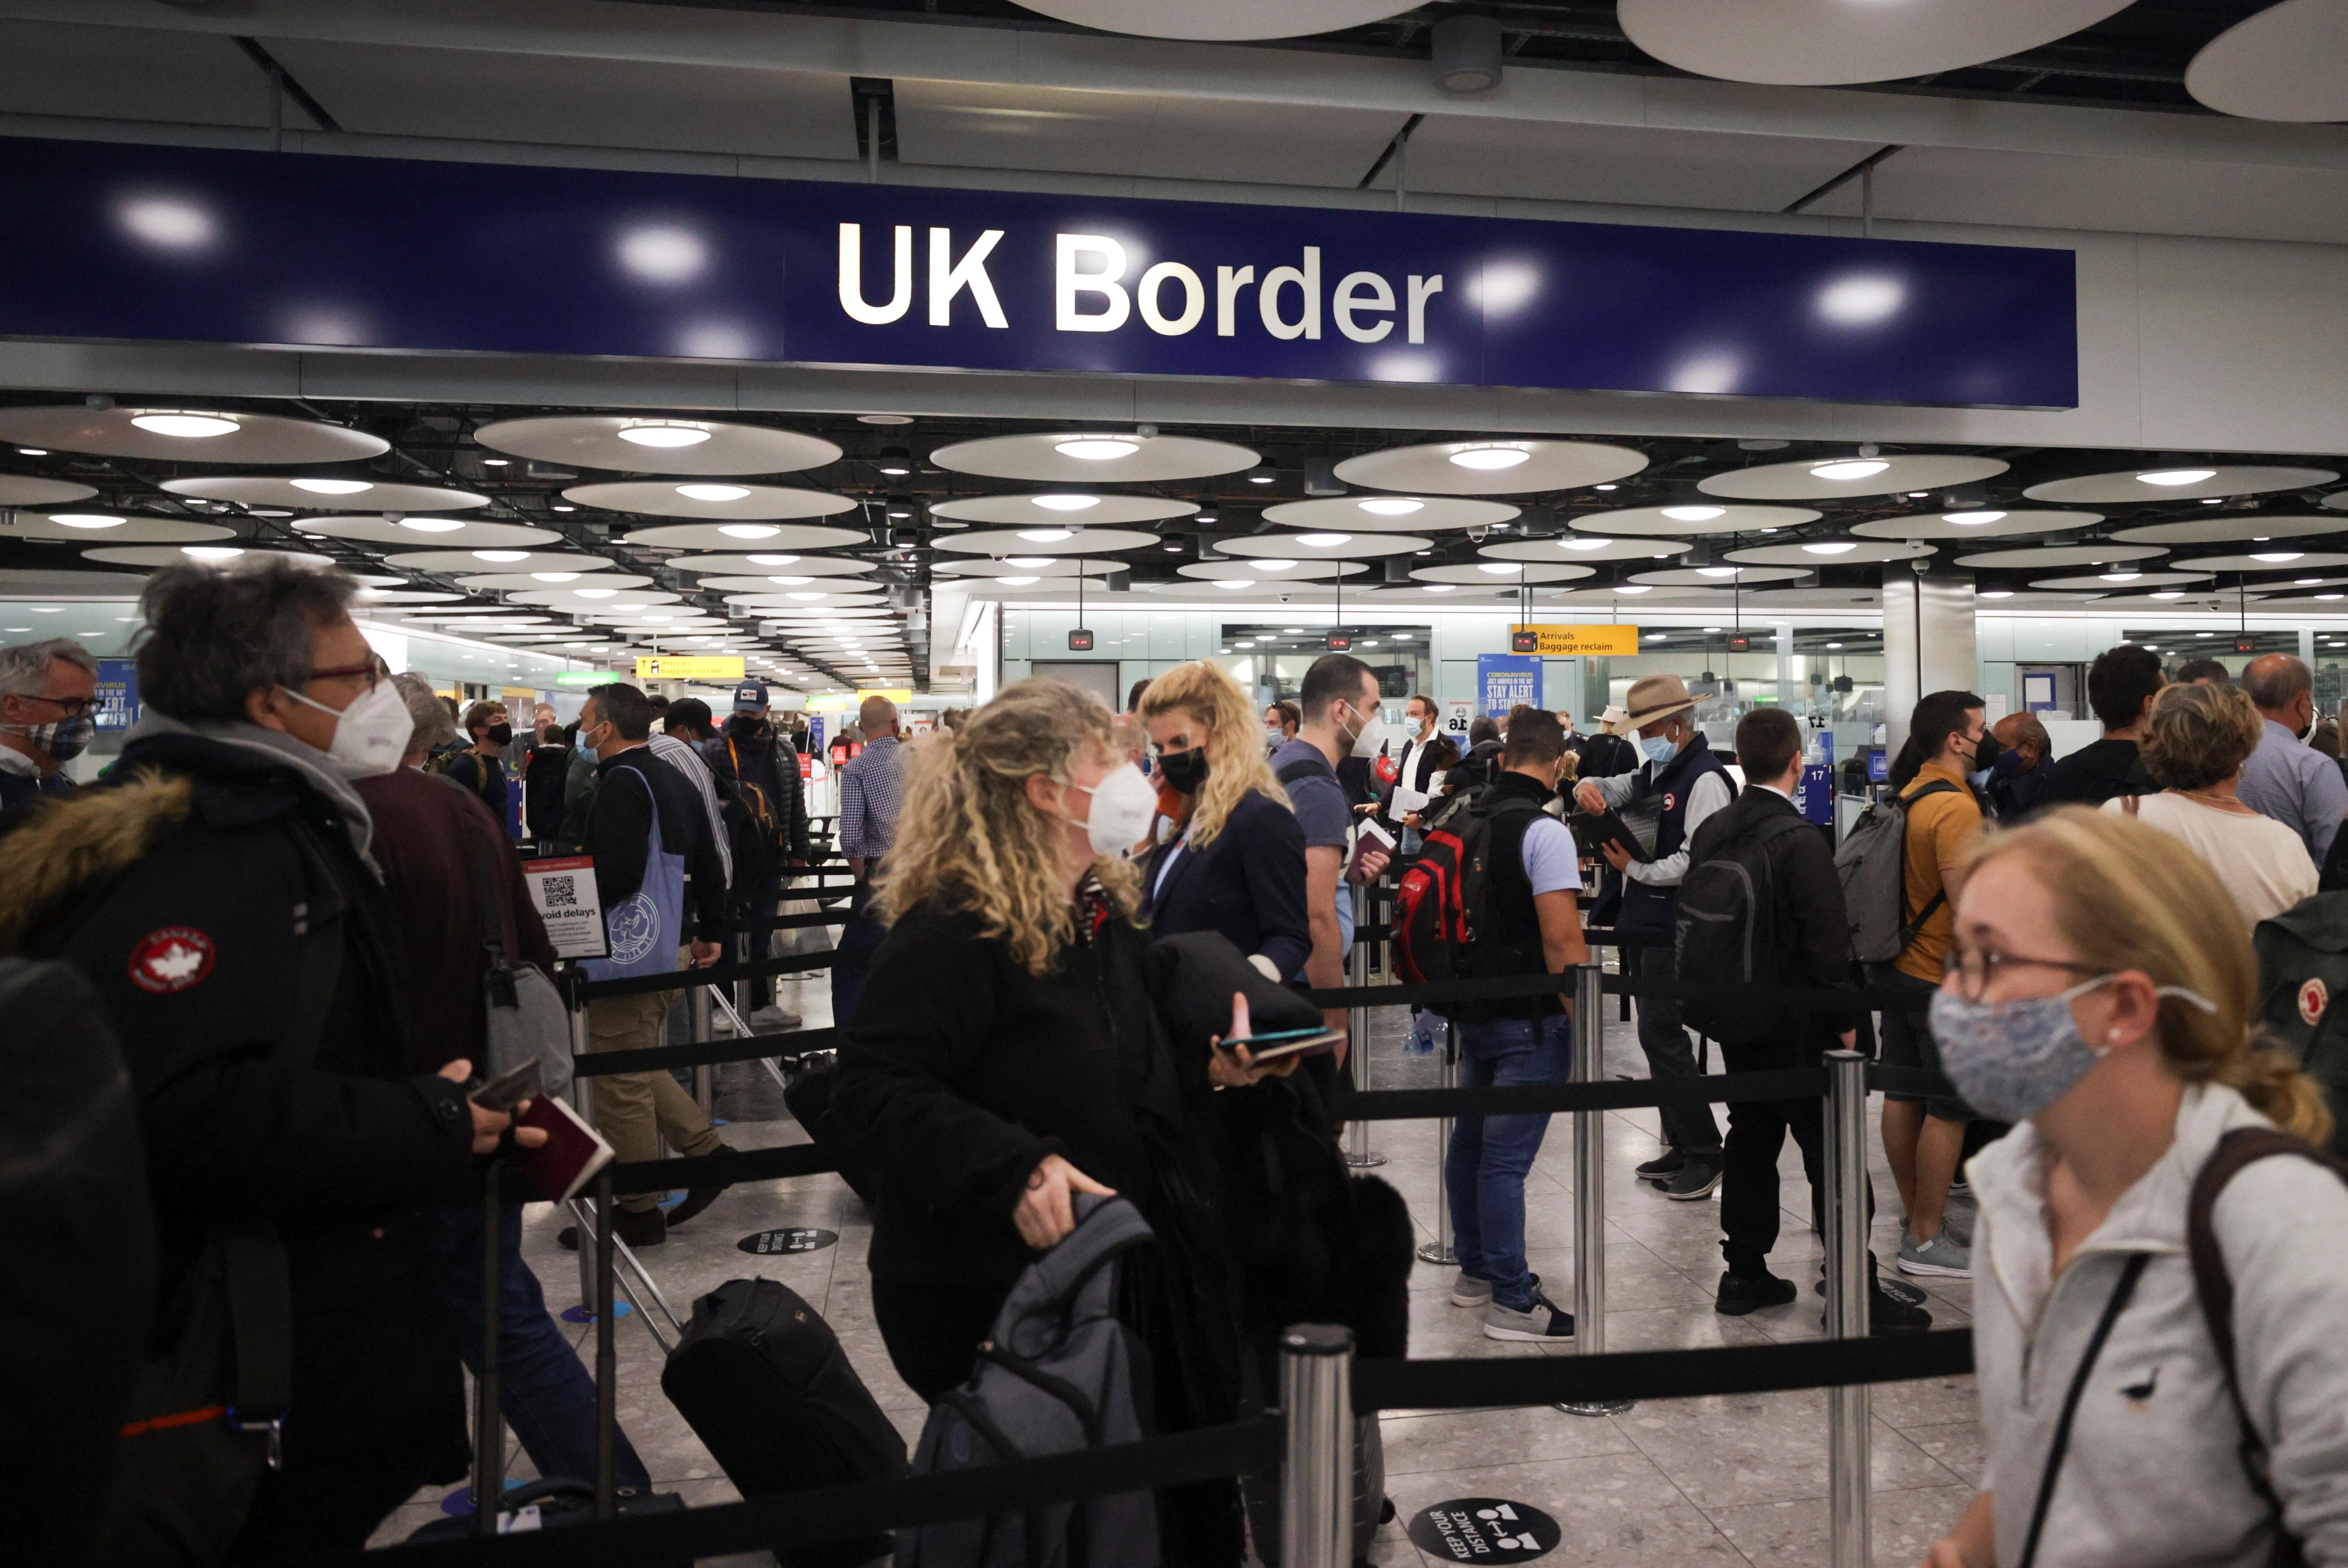 Arriving passengers queue at UK Border Control at the Terminal 5 at Heathrow Airport in London, Britain June 29, 2021. REUTERS/Hannah Mckay